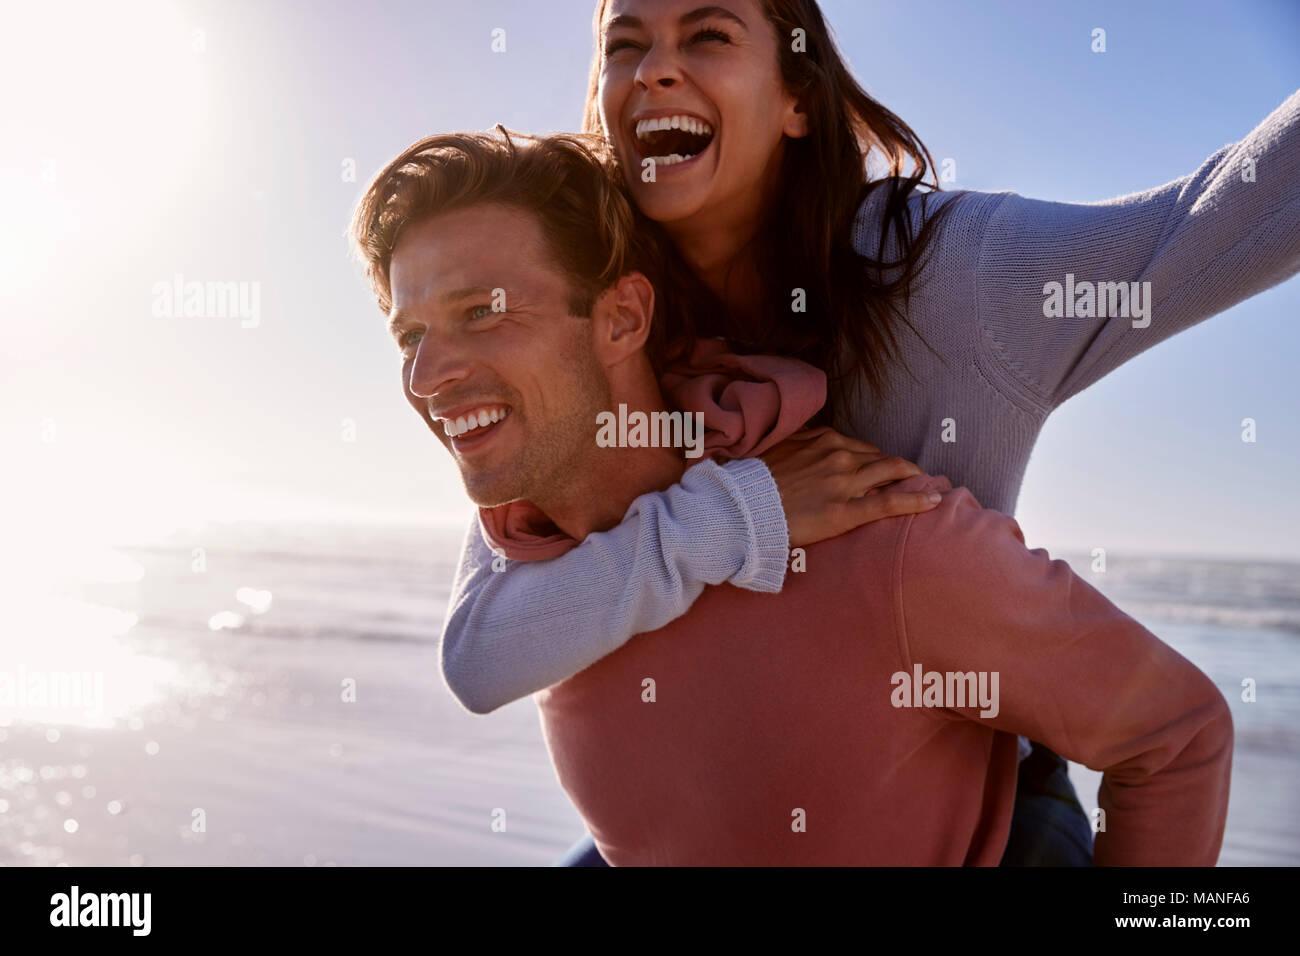 Mann, Frau, Huckepack auf Winter Urlaub am Strand Stockbild